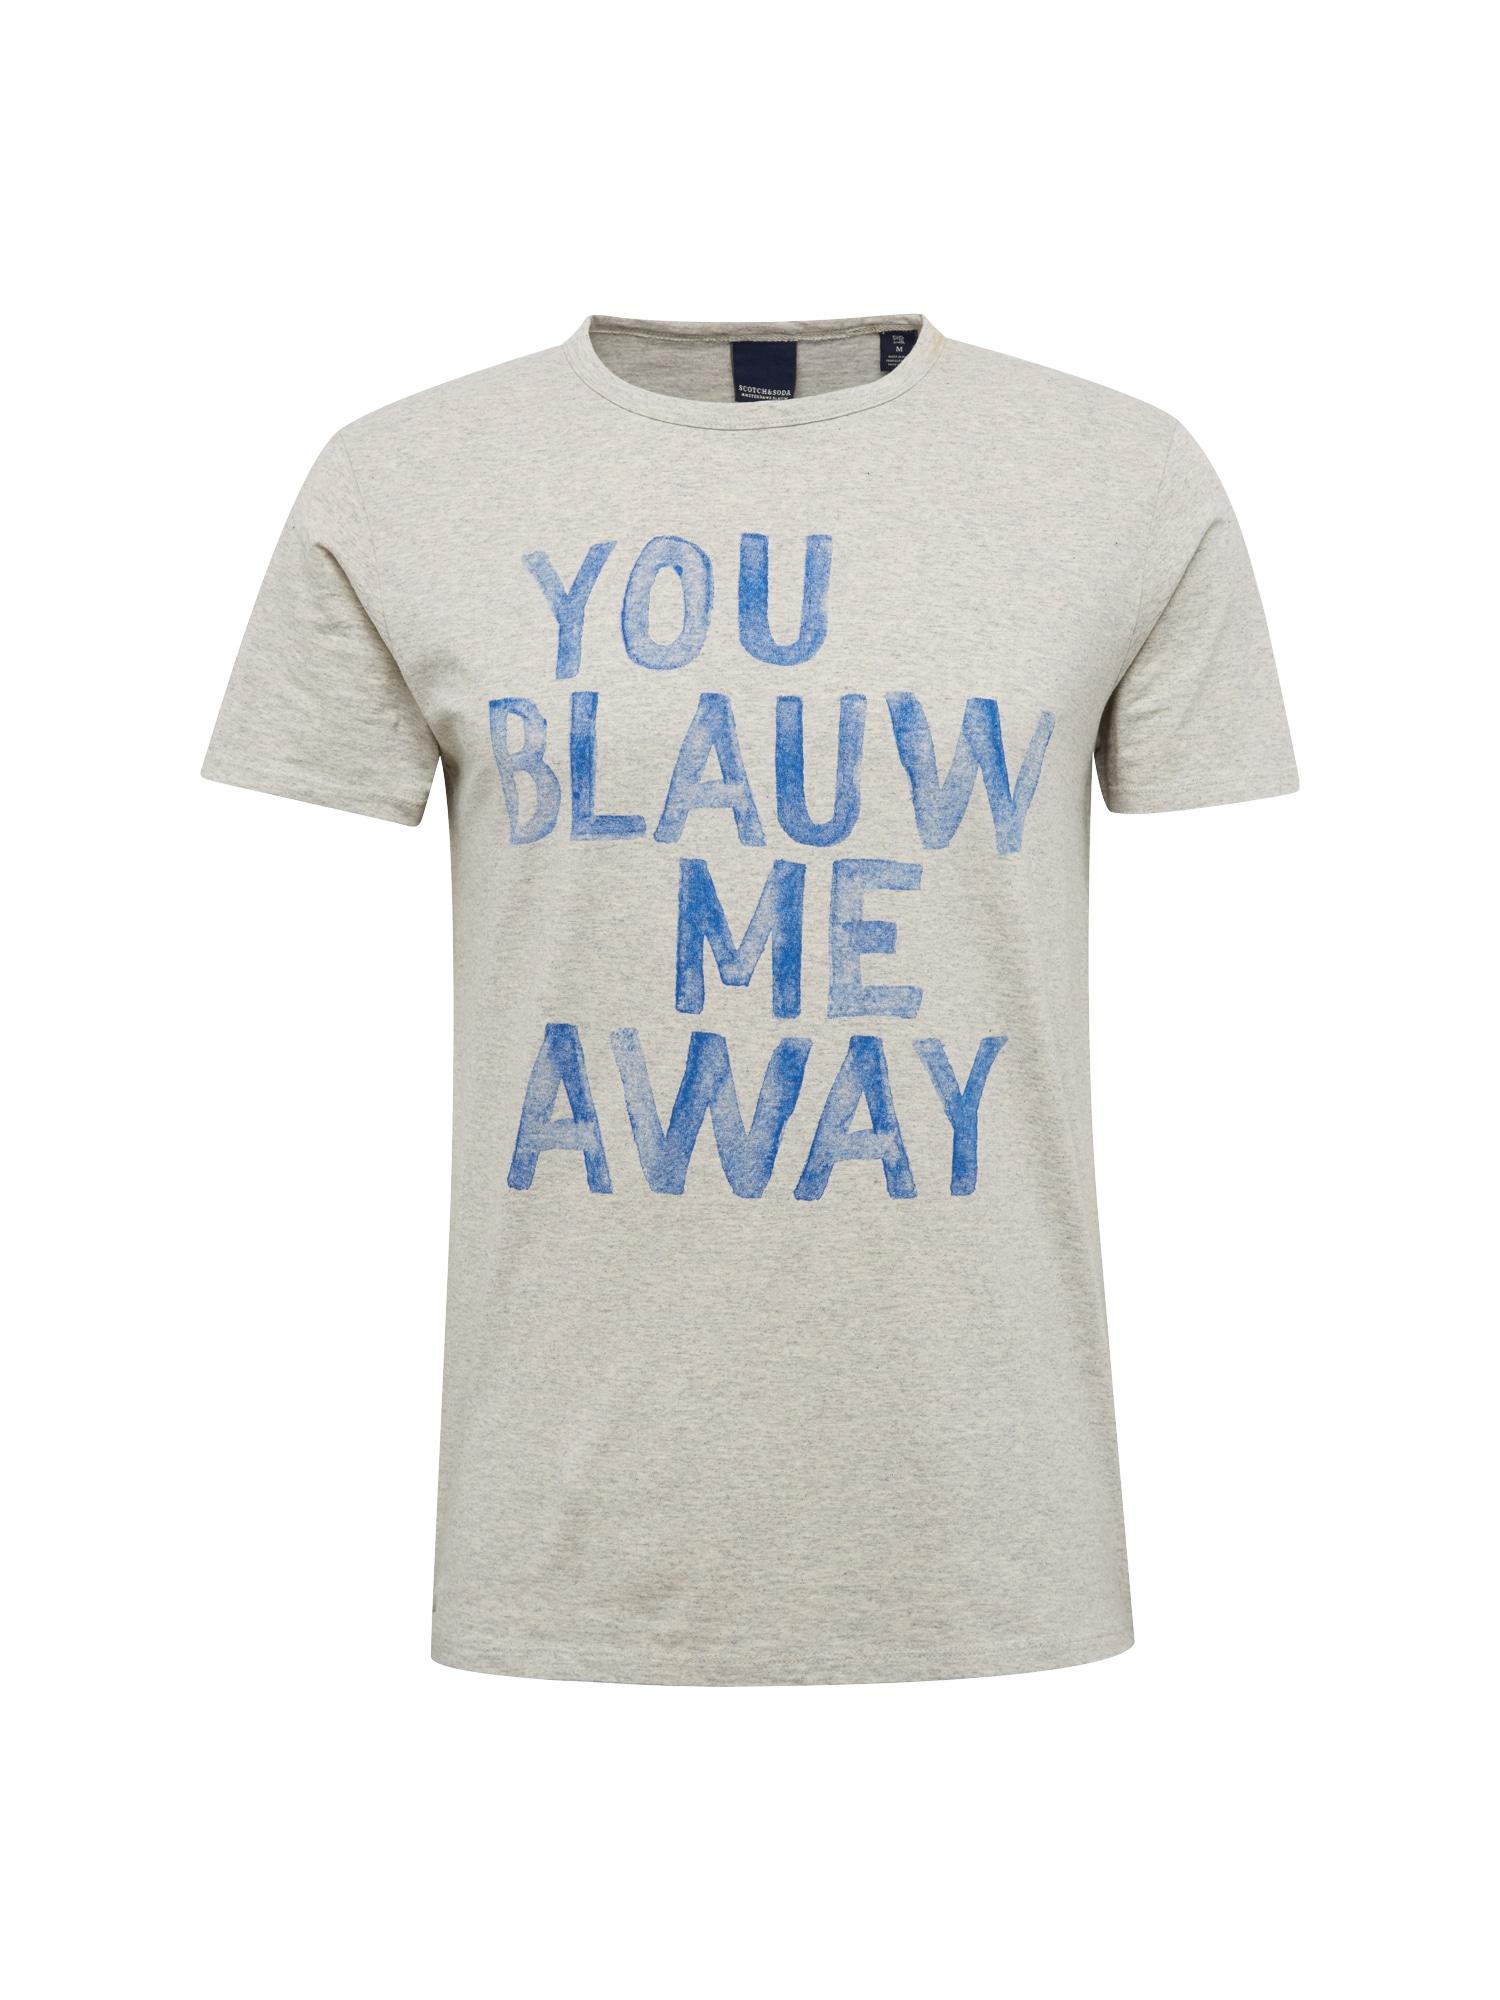 SCOTCH  and  SODA Heren Shirt Ams Blauw tee with artwork ecru blauw